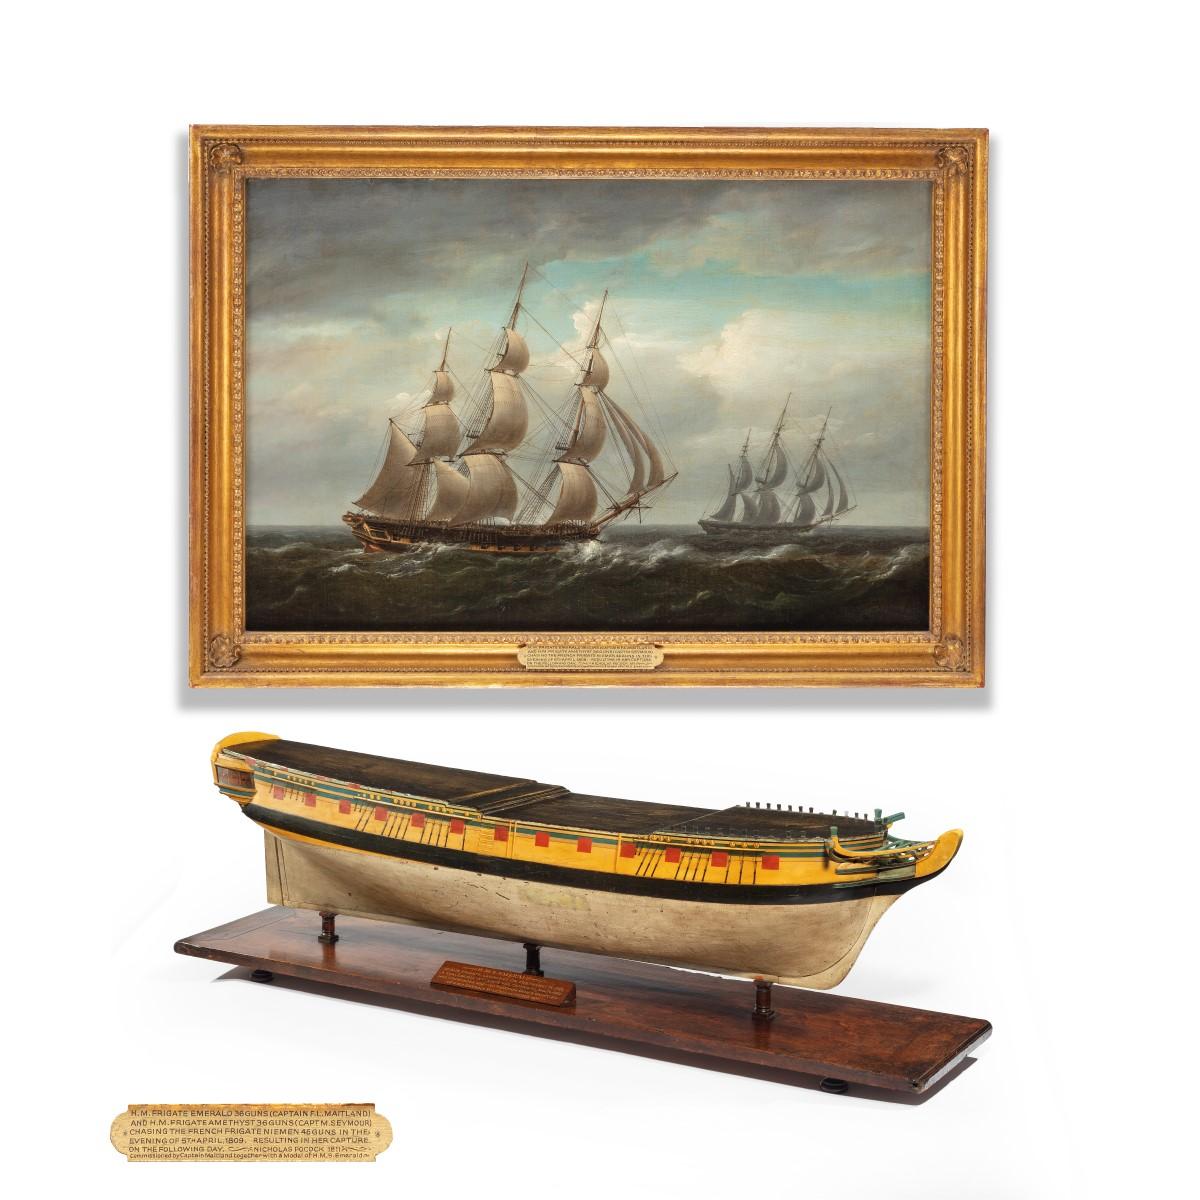 'HMS Emerald and HMS Amethyst' by Pocock